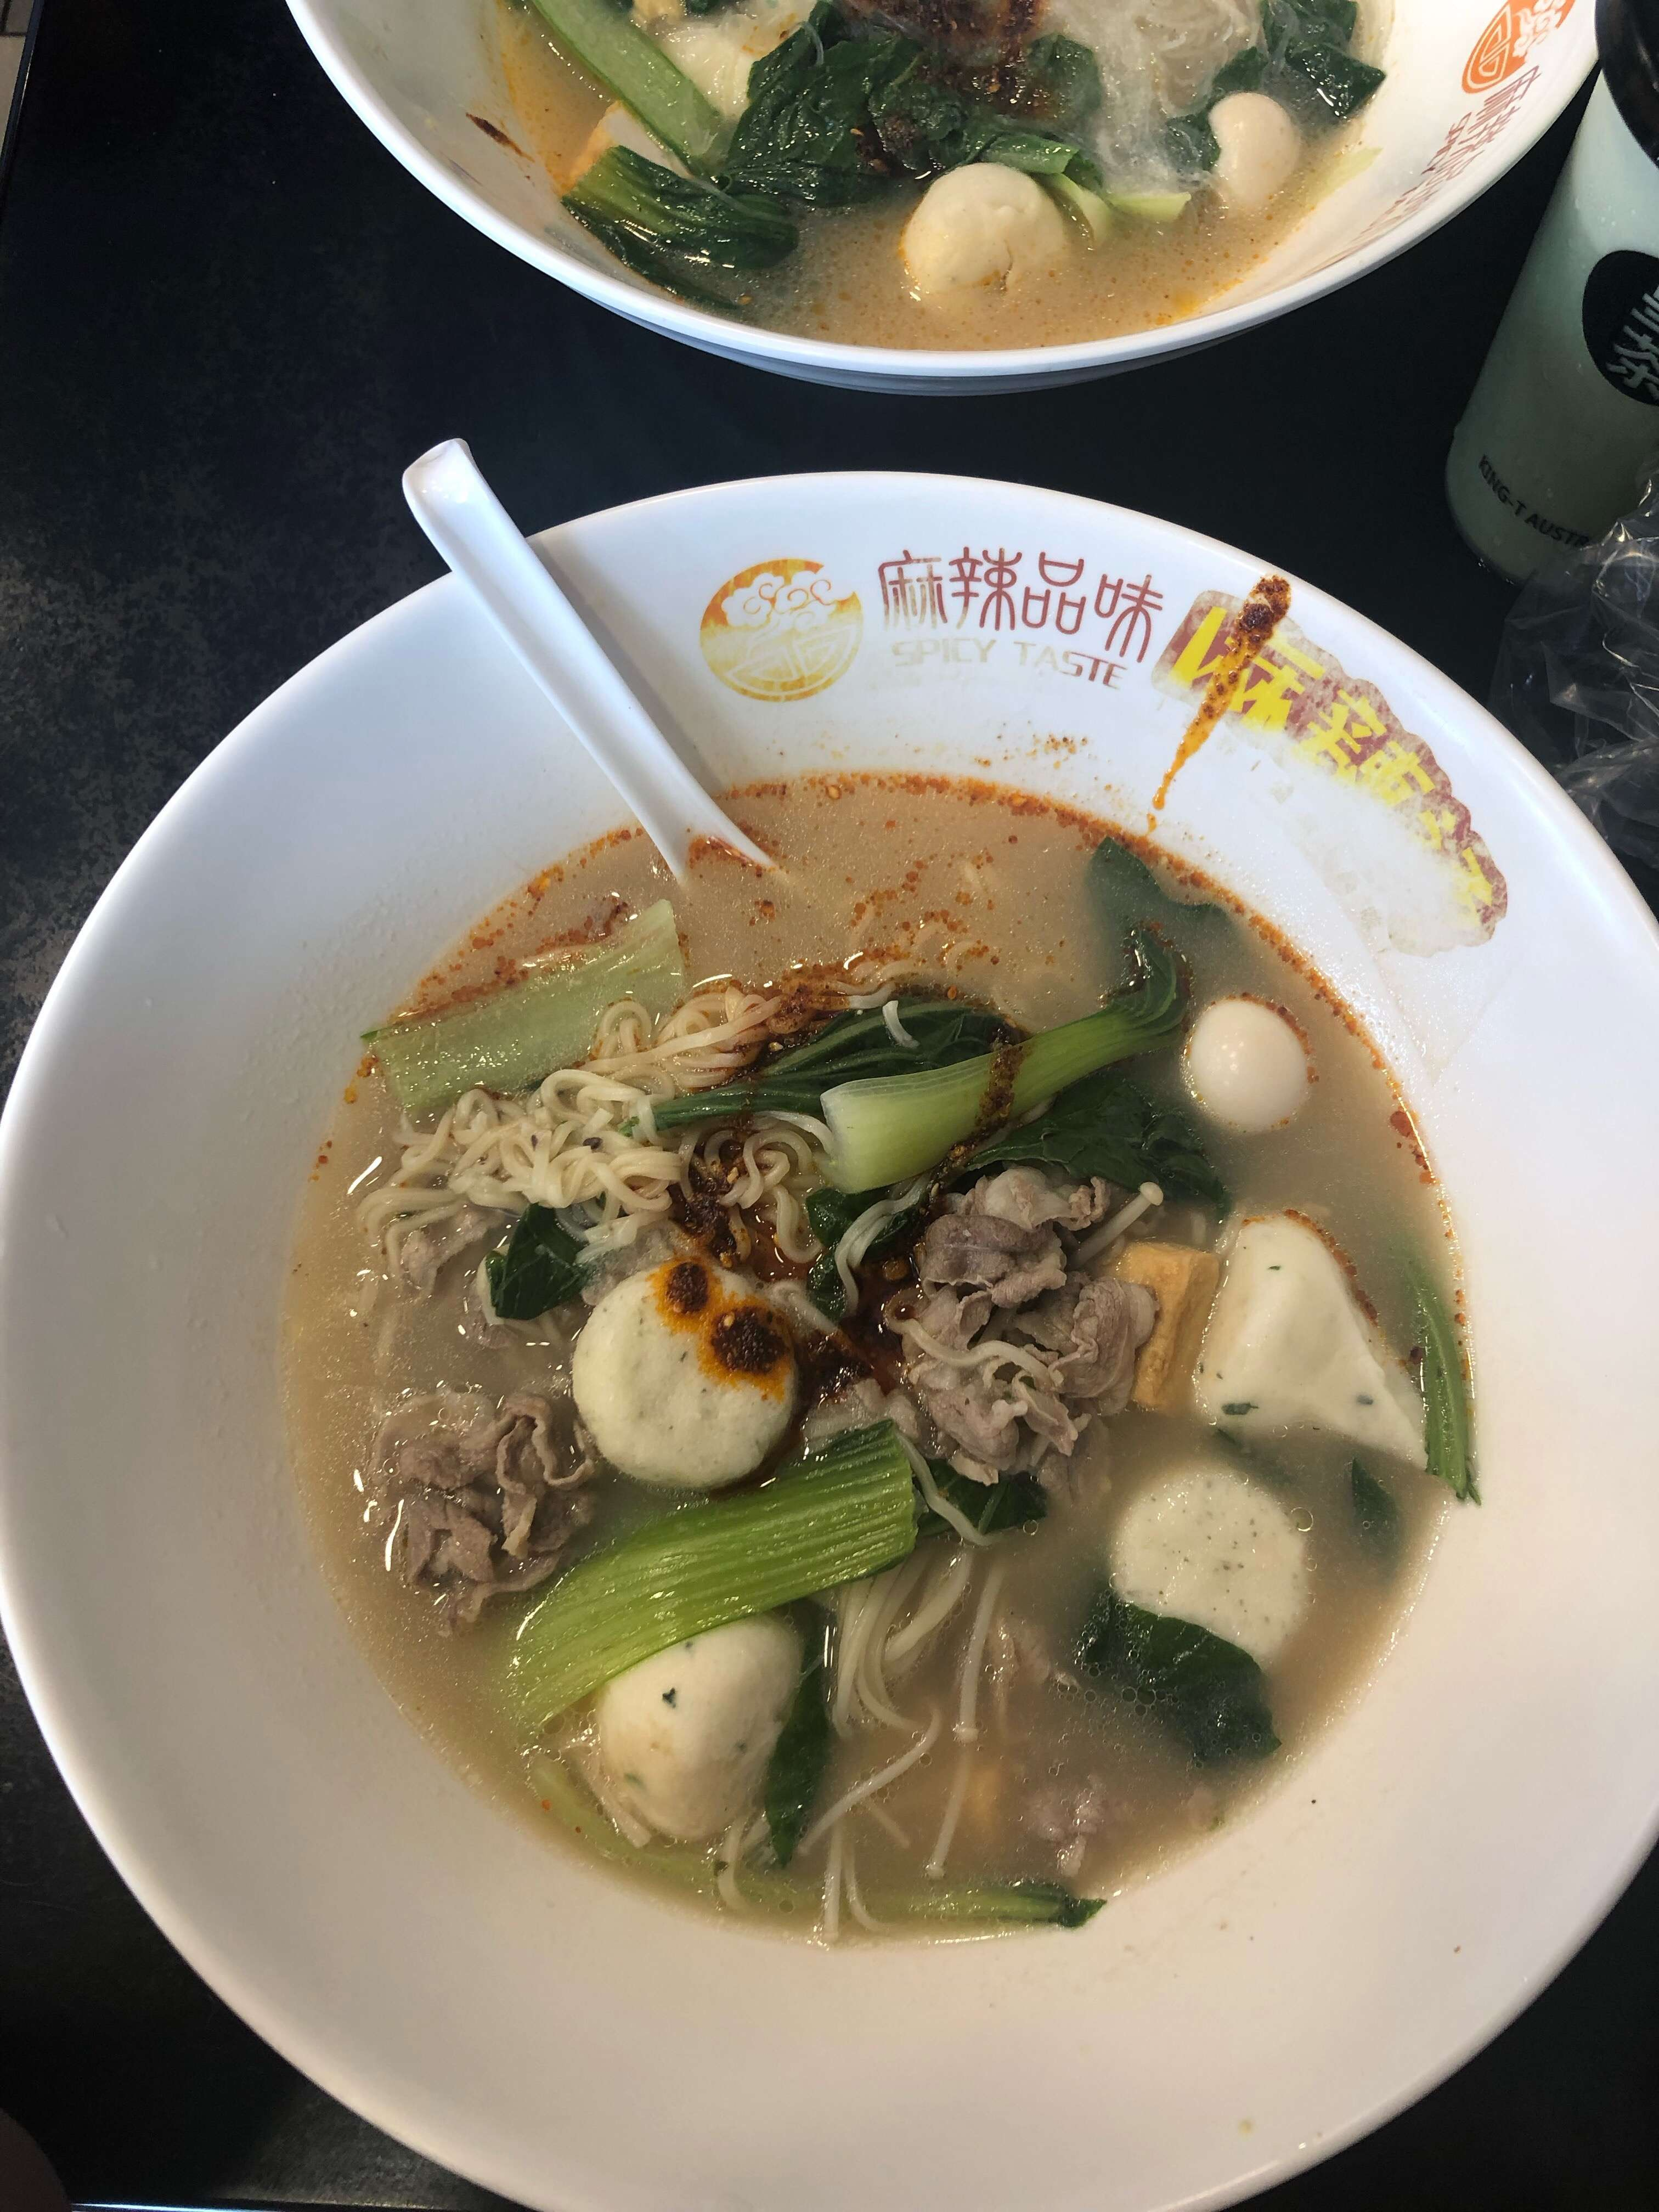 Spicy Taste Malatang